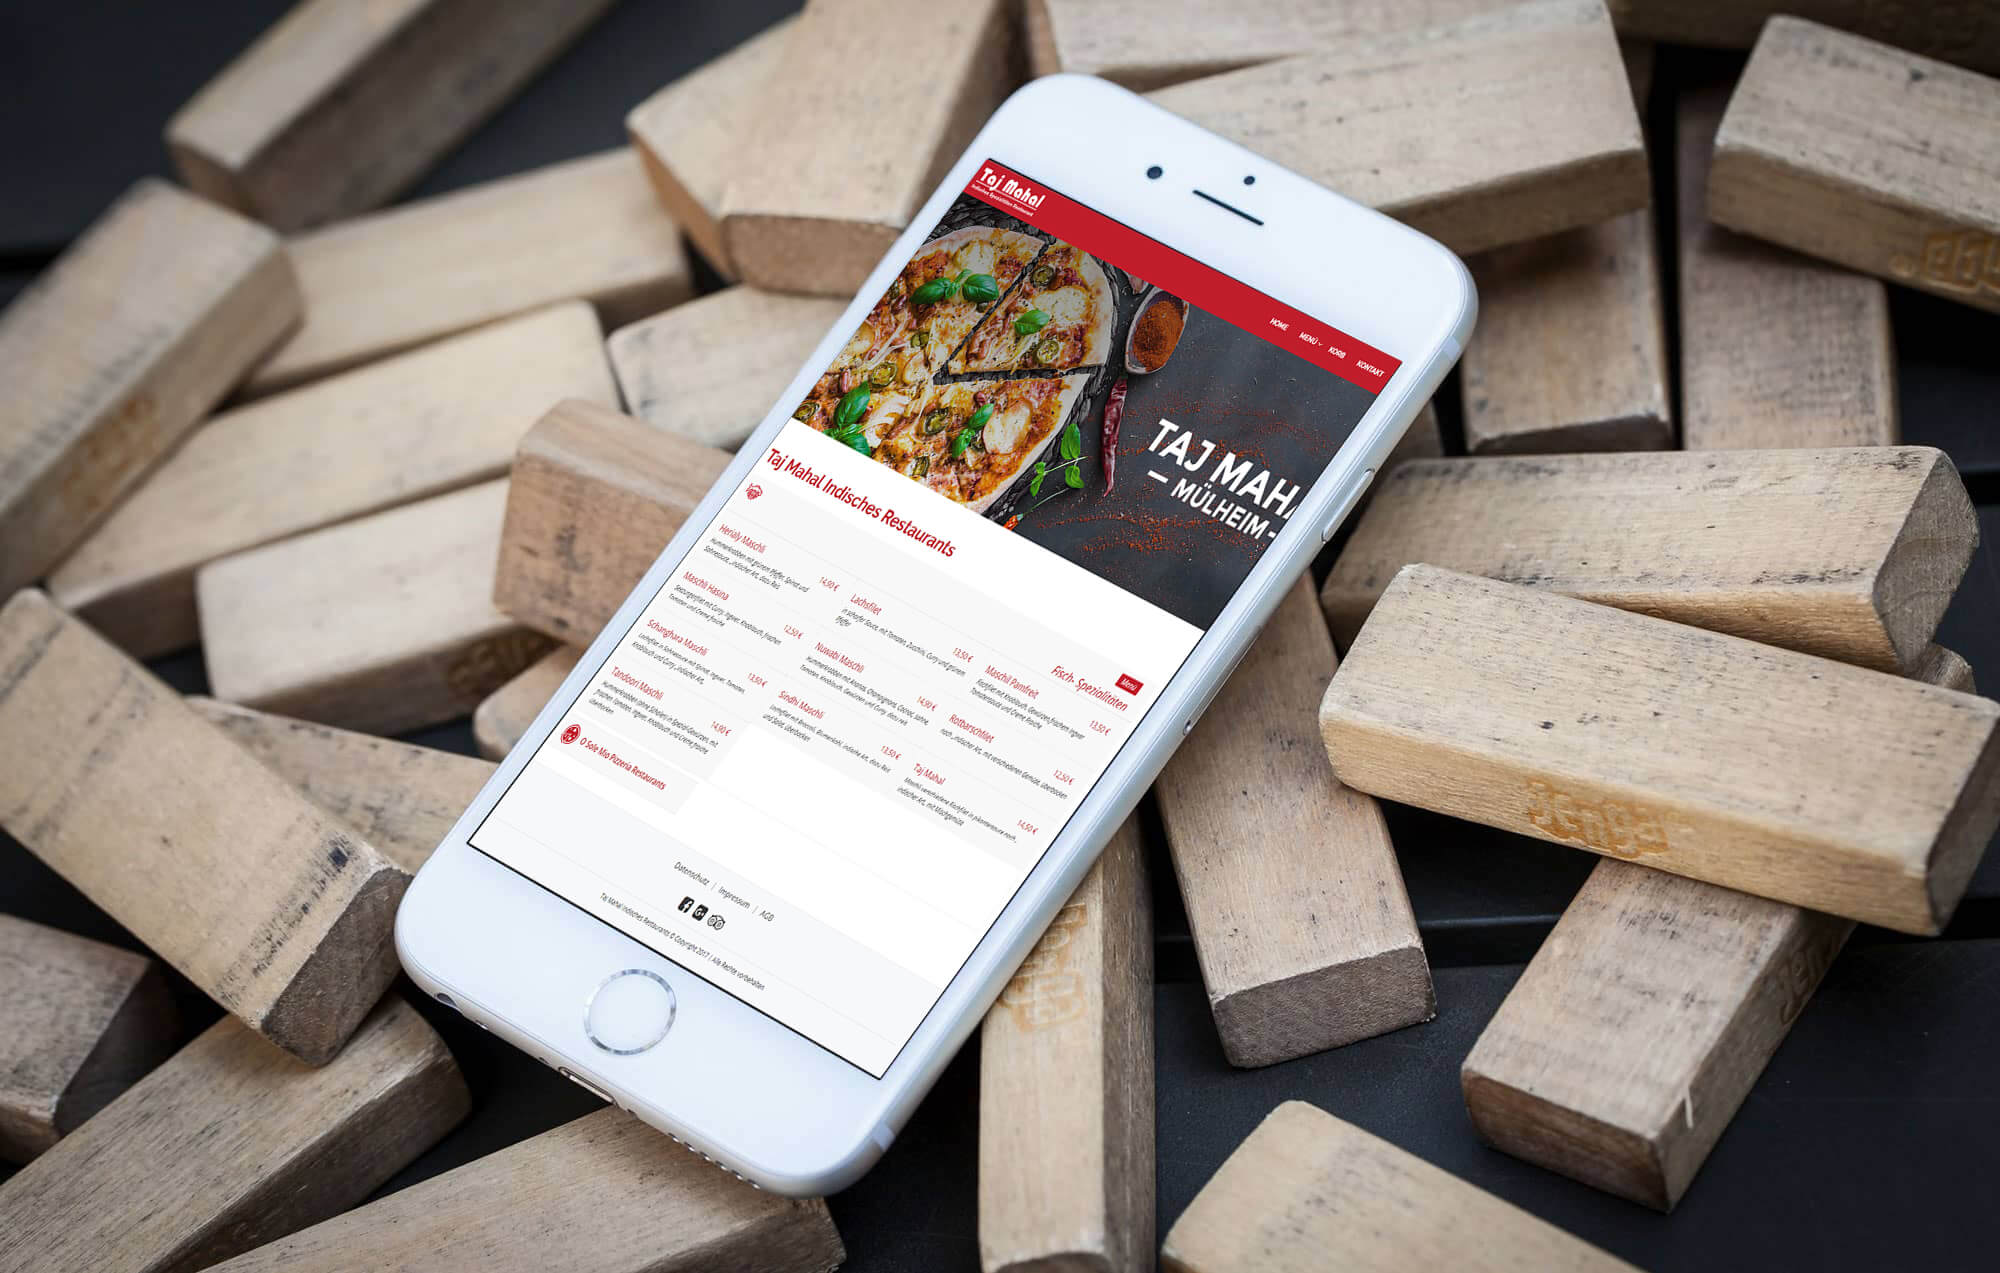 Brandcrock-Taj Mahal Restaurants iphone